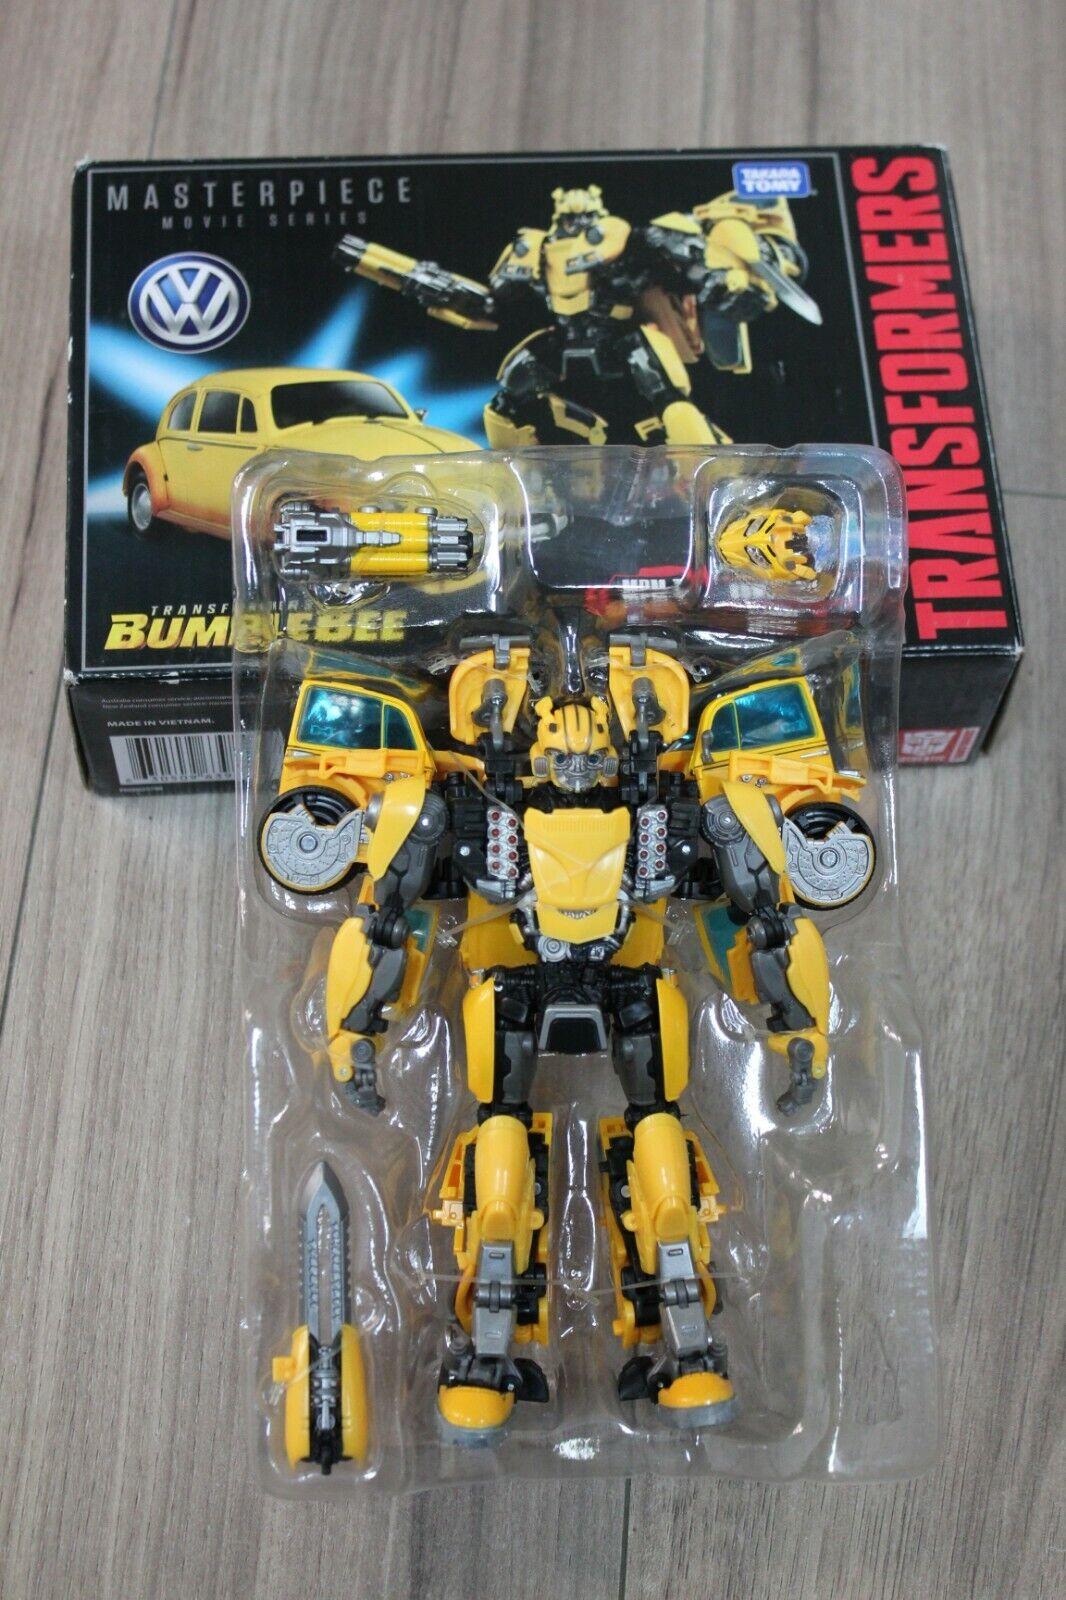 Hasbro Masterpiece Movie Series  Transformers Bumblebee MPM-7  produttori fornitura diretta